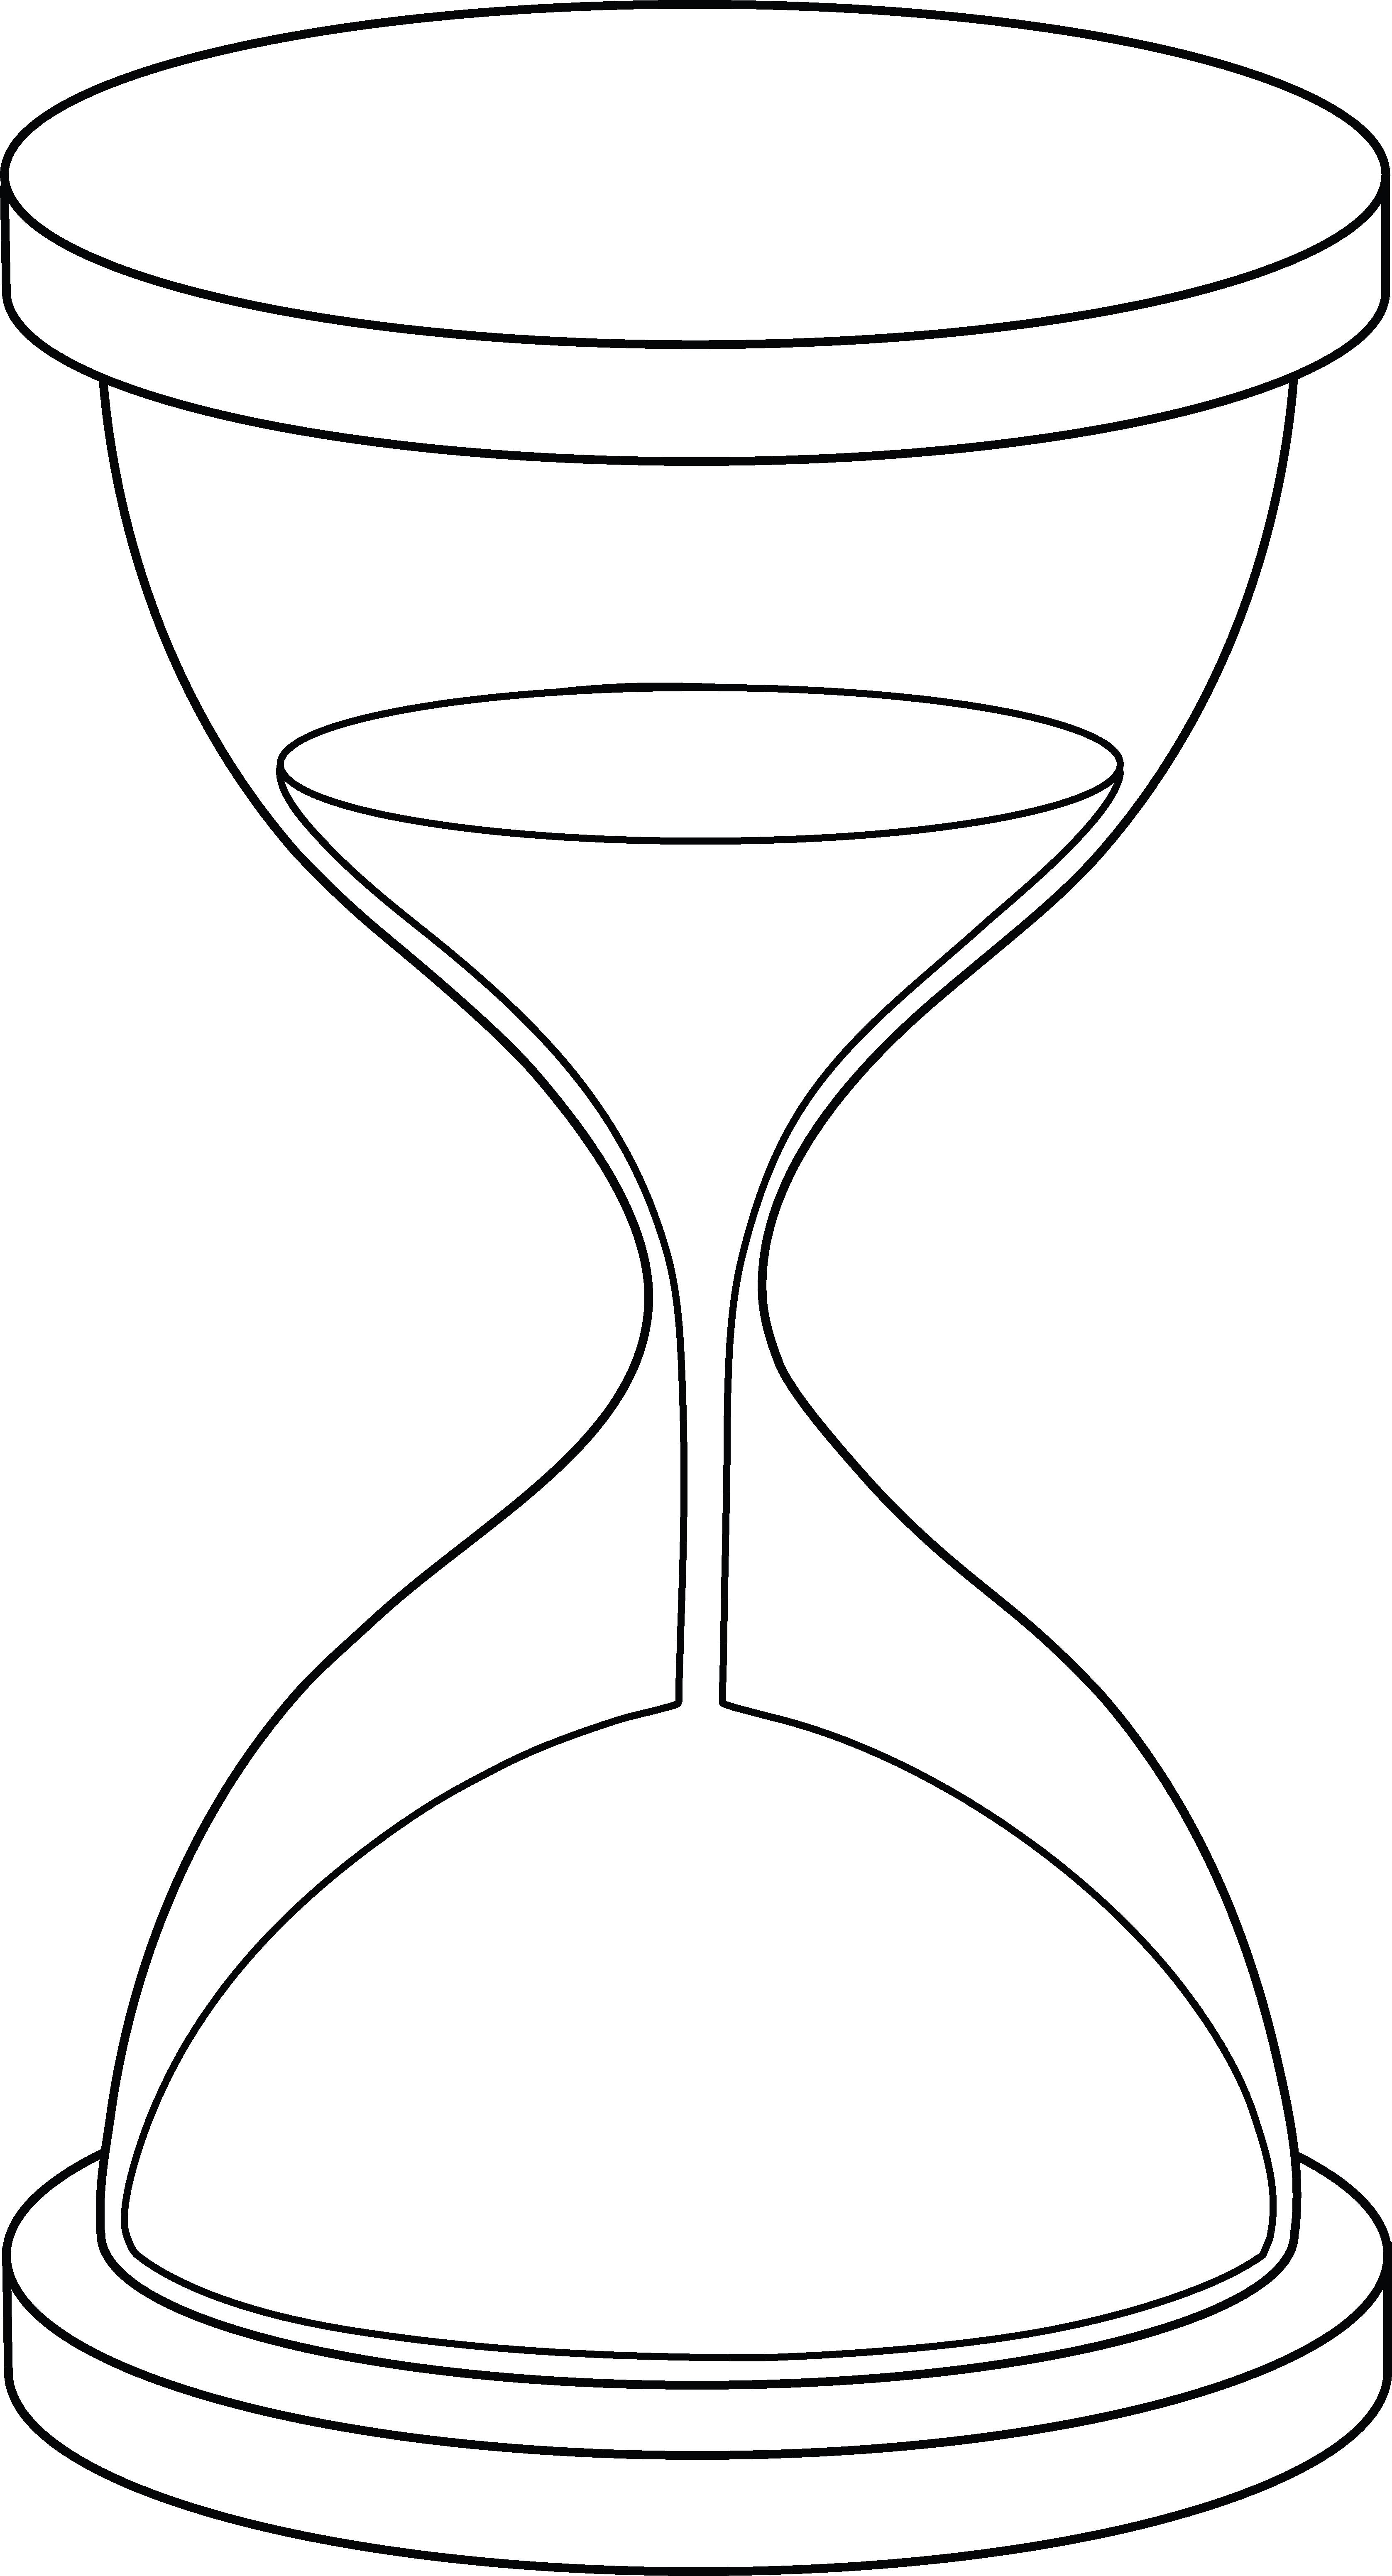 Hourglass Lineart Hourglass Drawing Hourglass Tattoo Line Art